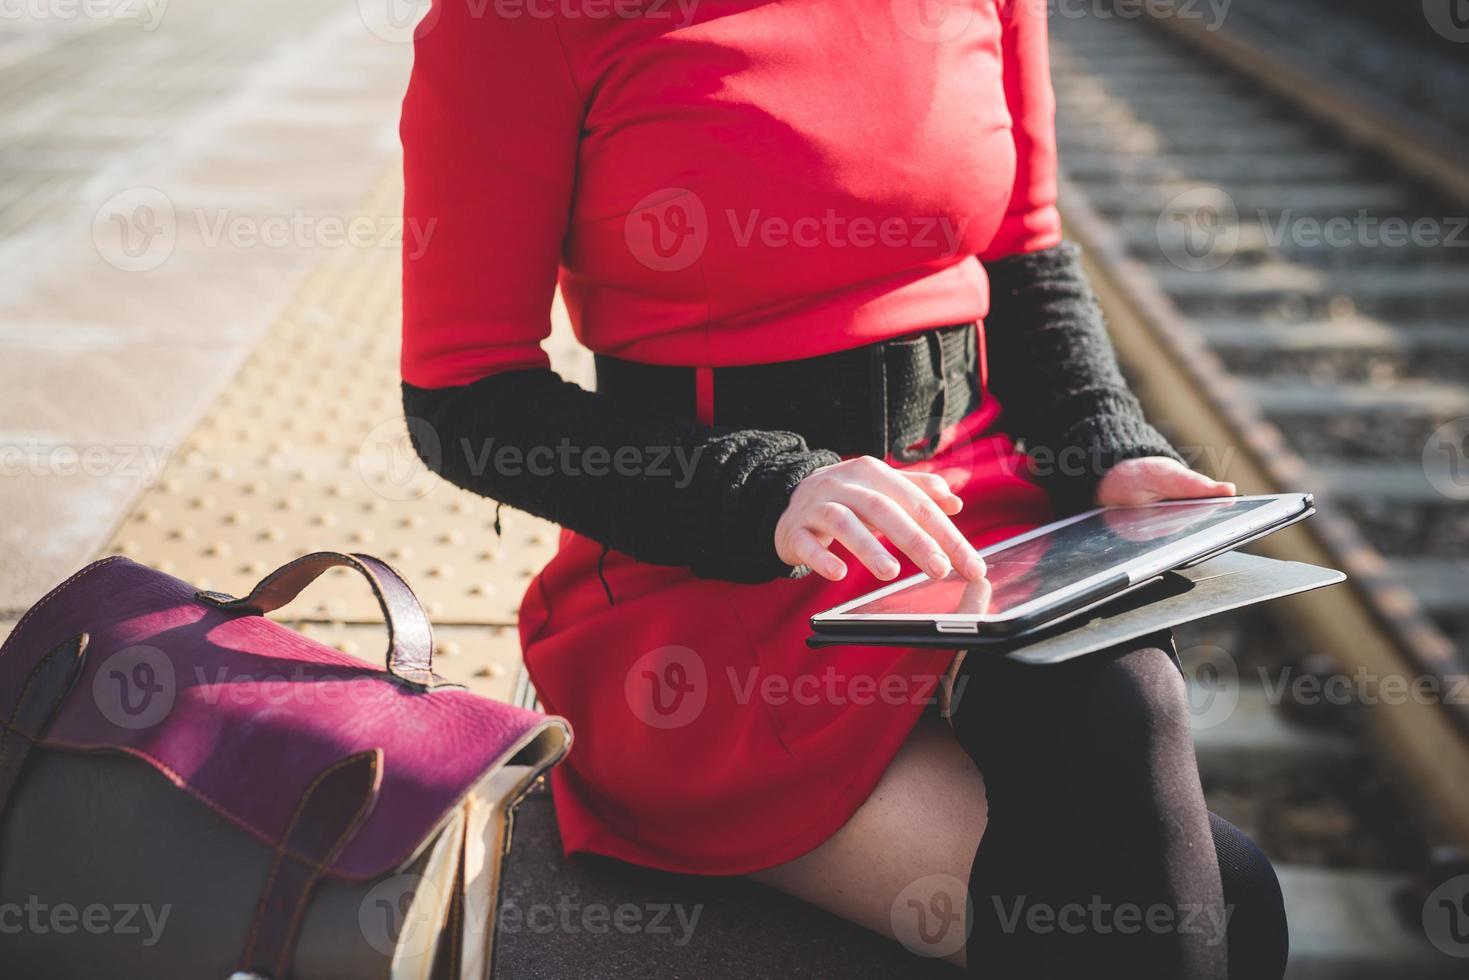 Nahaufnahme Hände Frau mit Tablette am Bahnhof foto